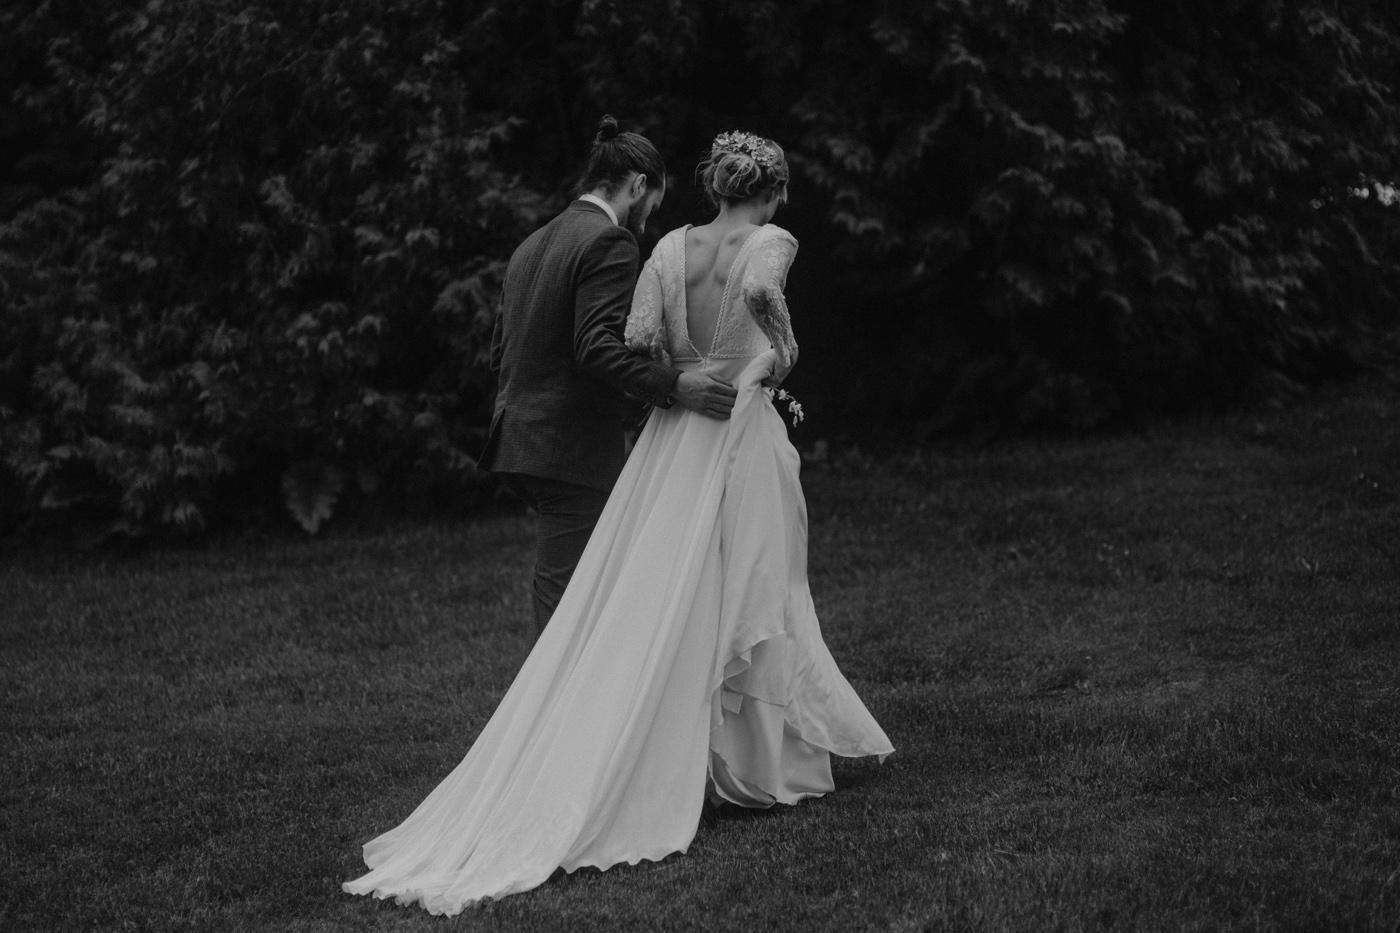 Erin-Mike-Intimate-Vintage-Wedding-Shelburne-Farms-Vermont -137.jpg